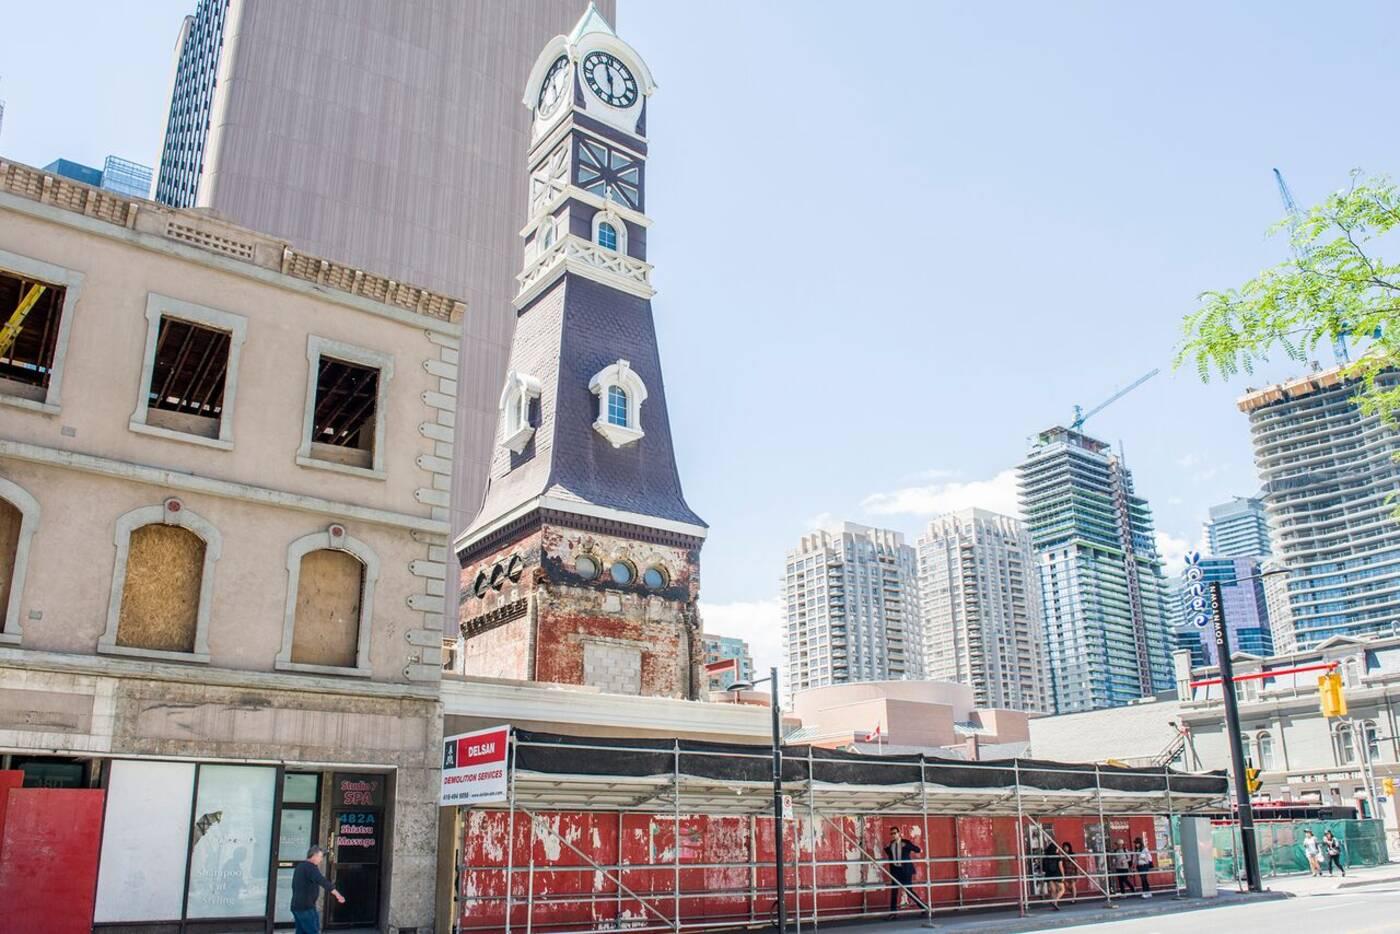 toronto clock tower